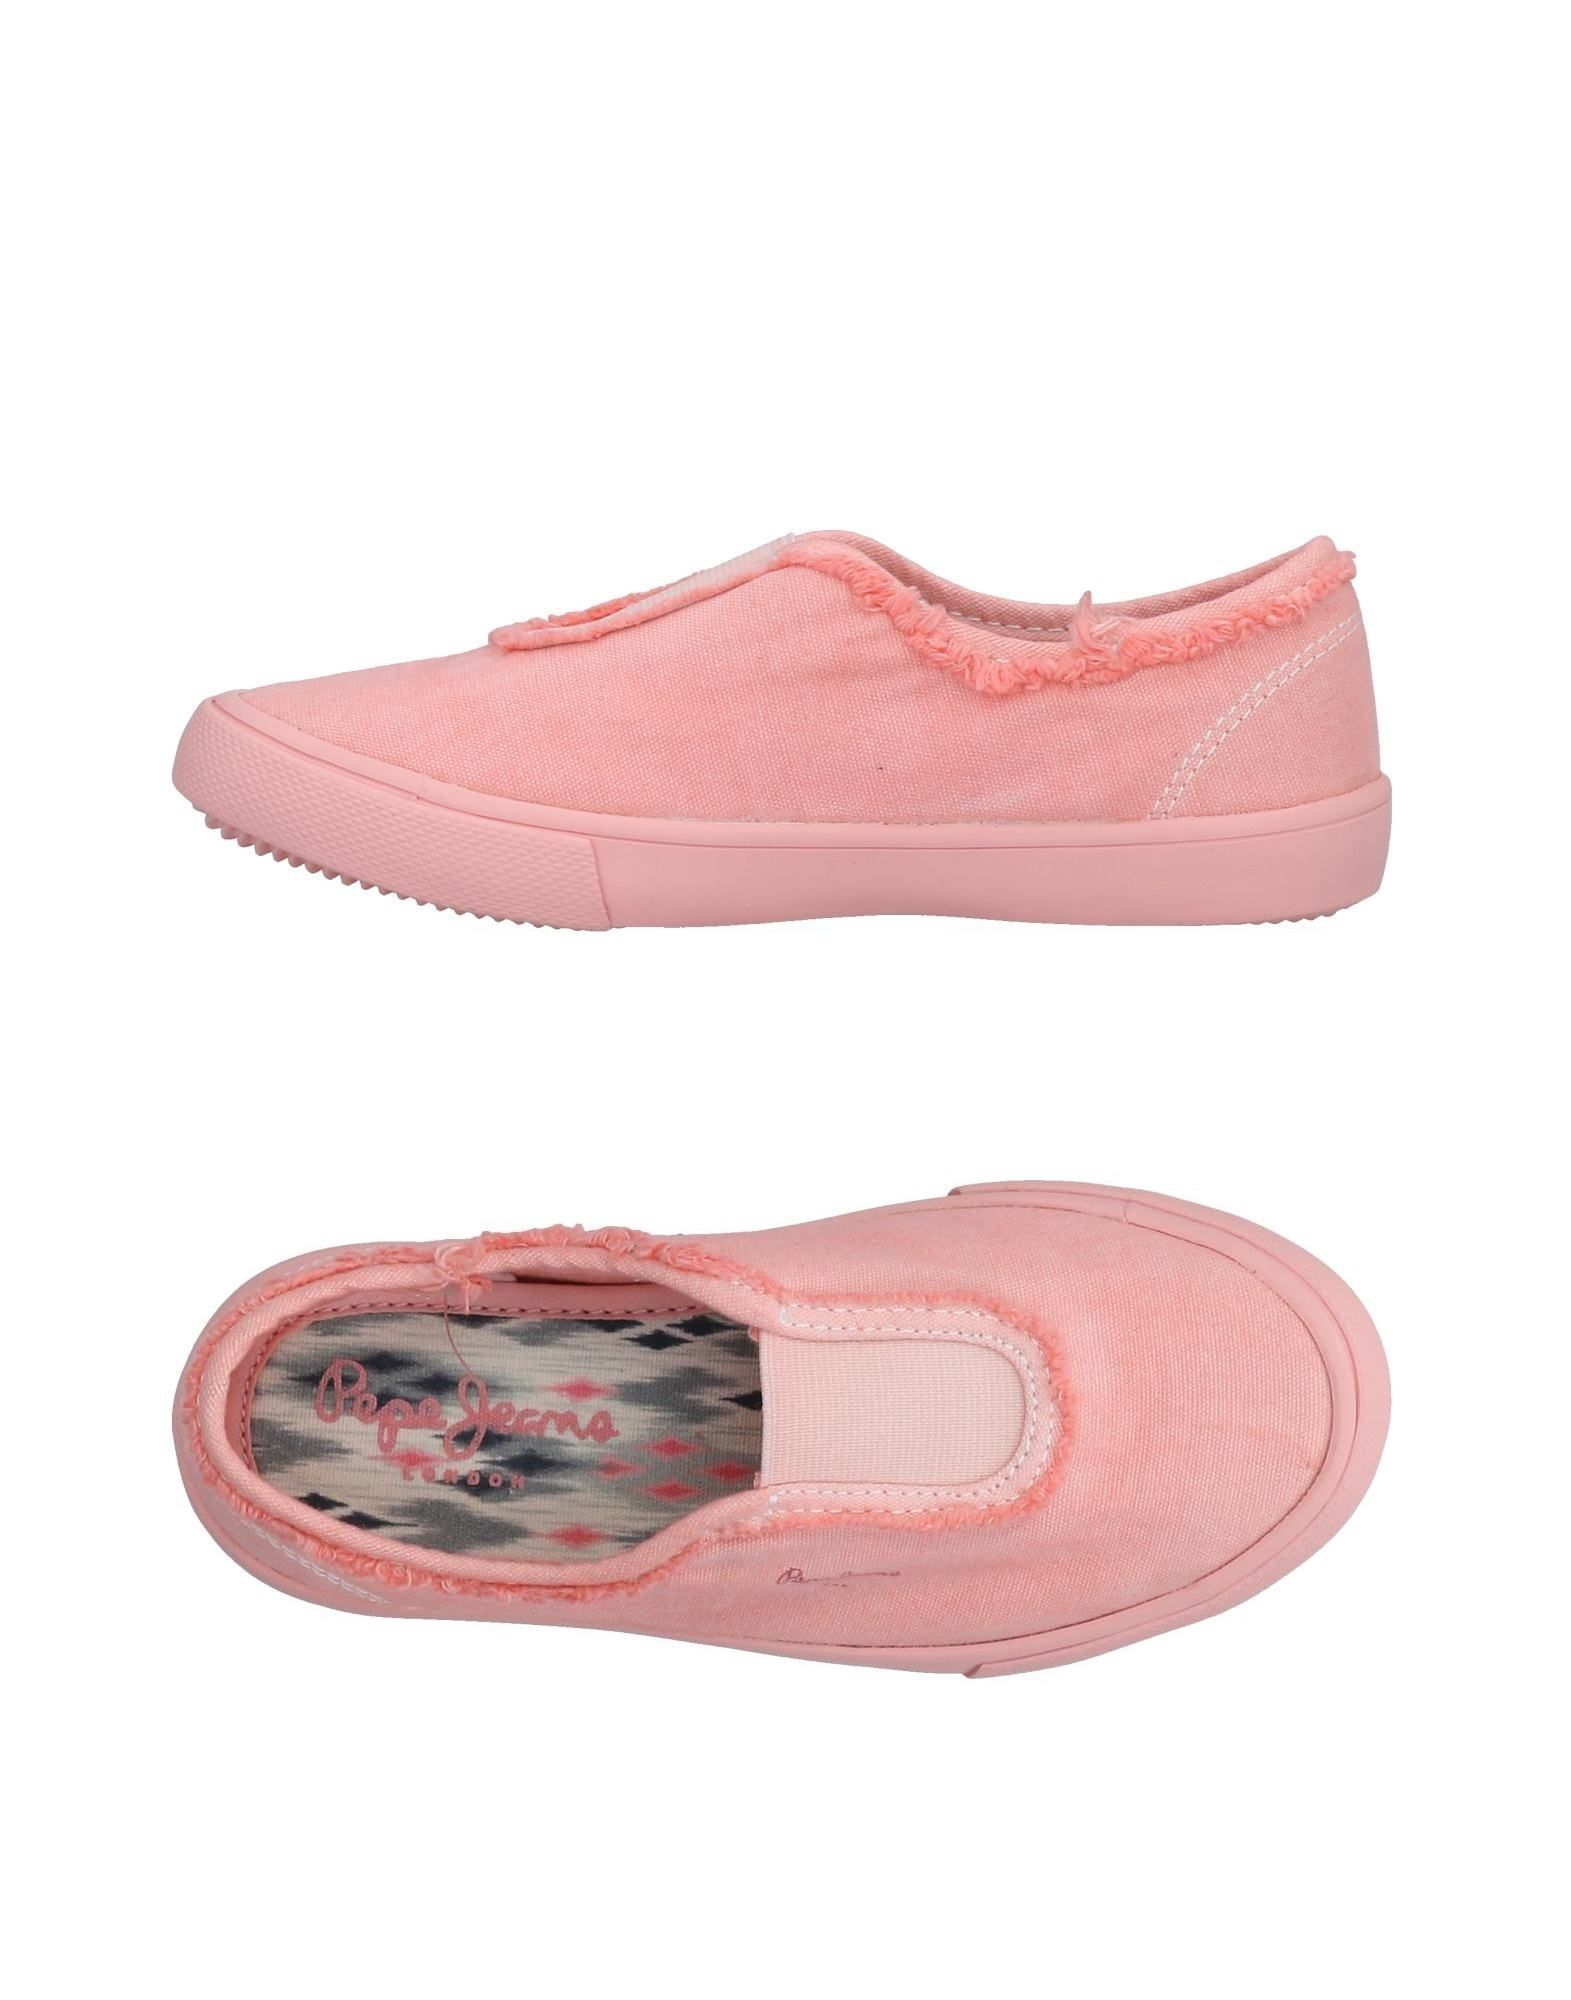 PEPE JEANS Mädchen 3-8 jahre Low Sneakers & Tennisschuhe7 rosa